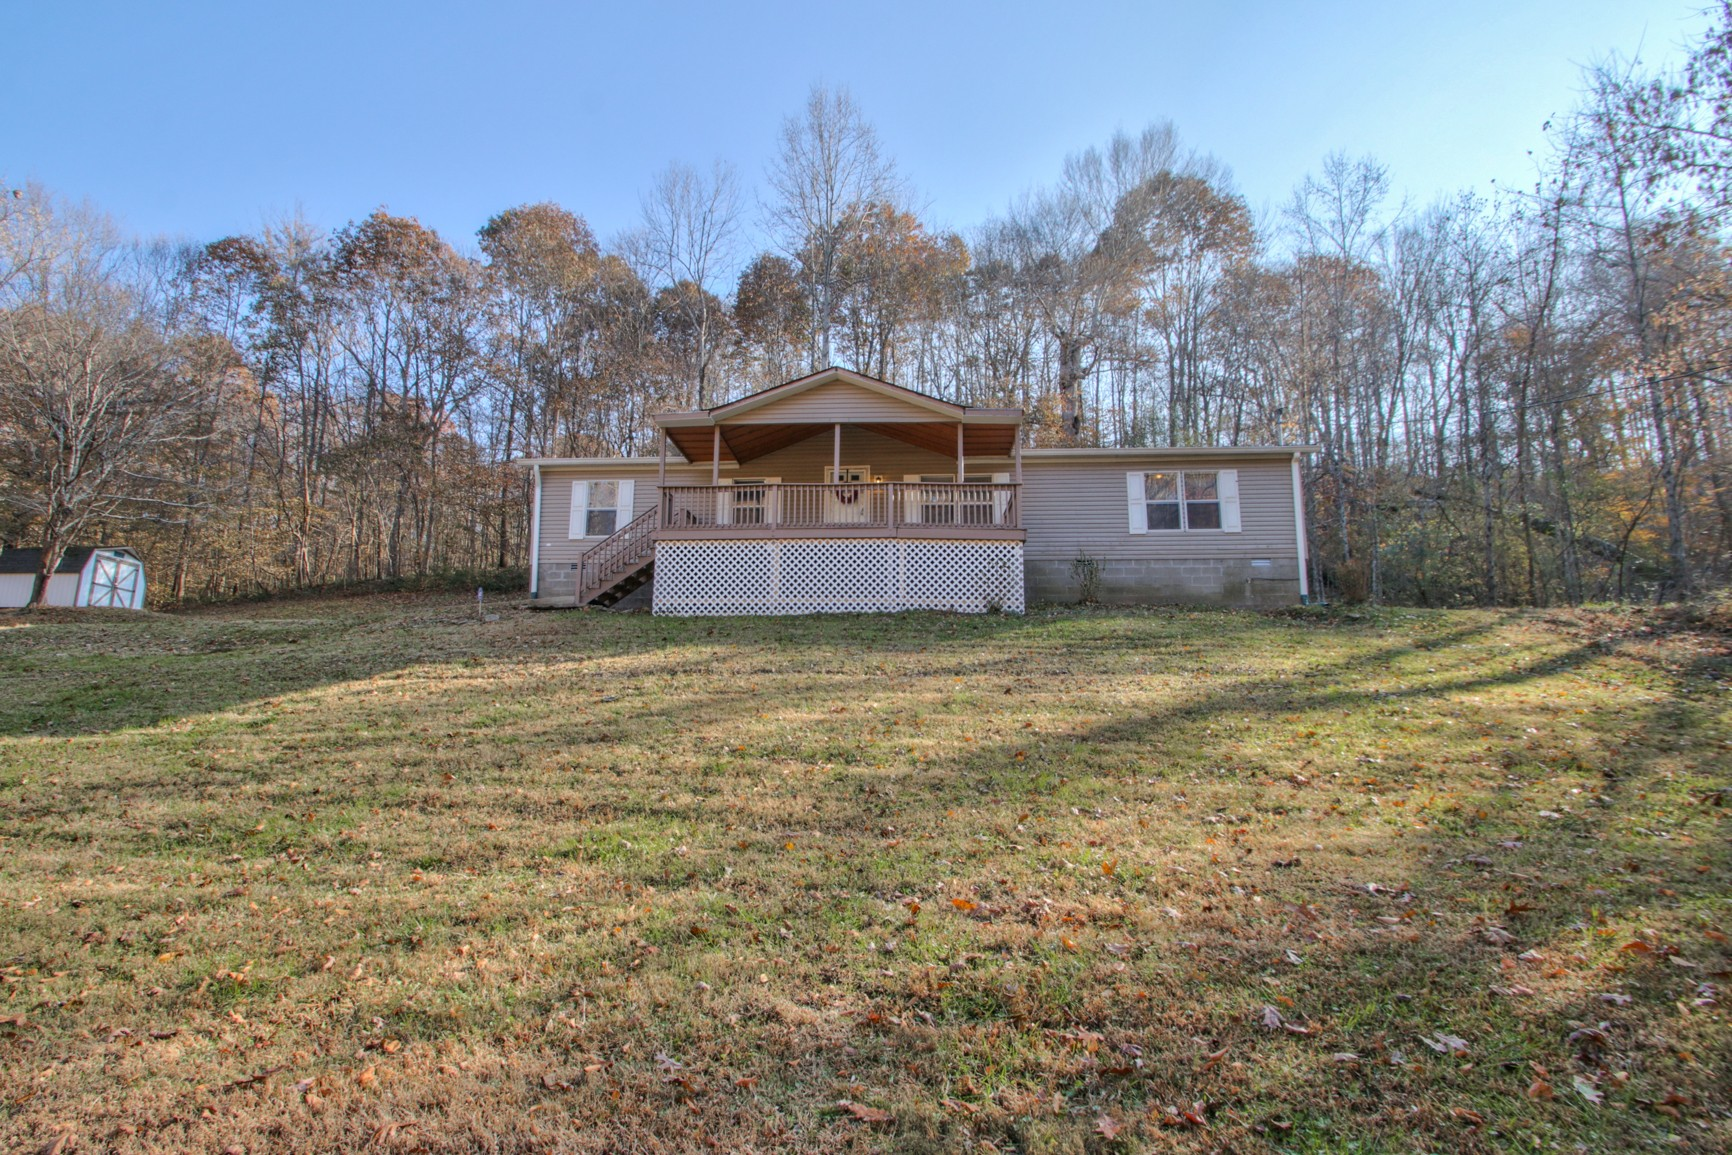 2825 Claylick Rd, Whites Creek, TN 37189 - Whites Creek, TN real estate listing